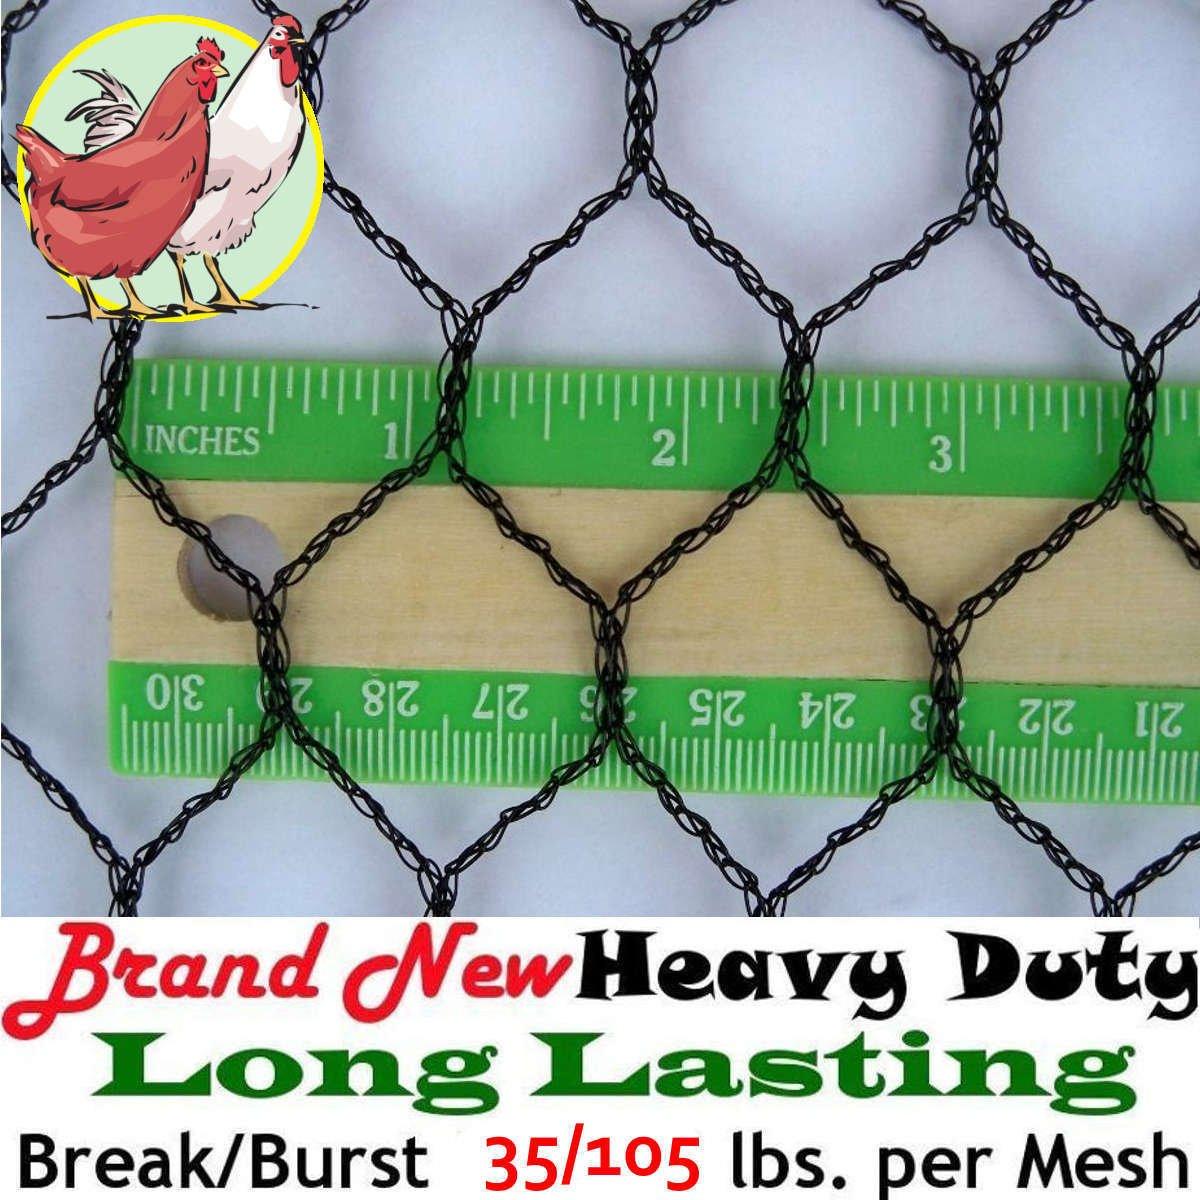 Pinnon Hatch Farms 1 Light Knitted Netting 25 X 100 Poultry Plant Bird Aviary Fruit Garden Protection Net Nets – Break Burst 35 105 lbs. per mesh